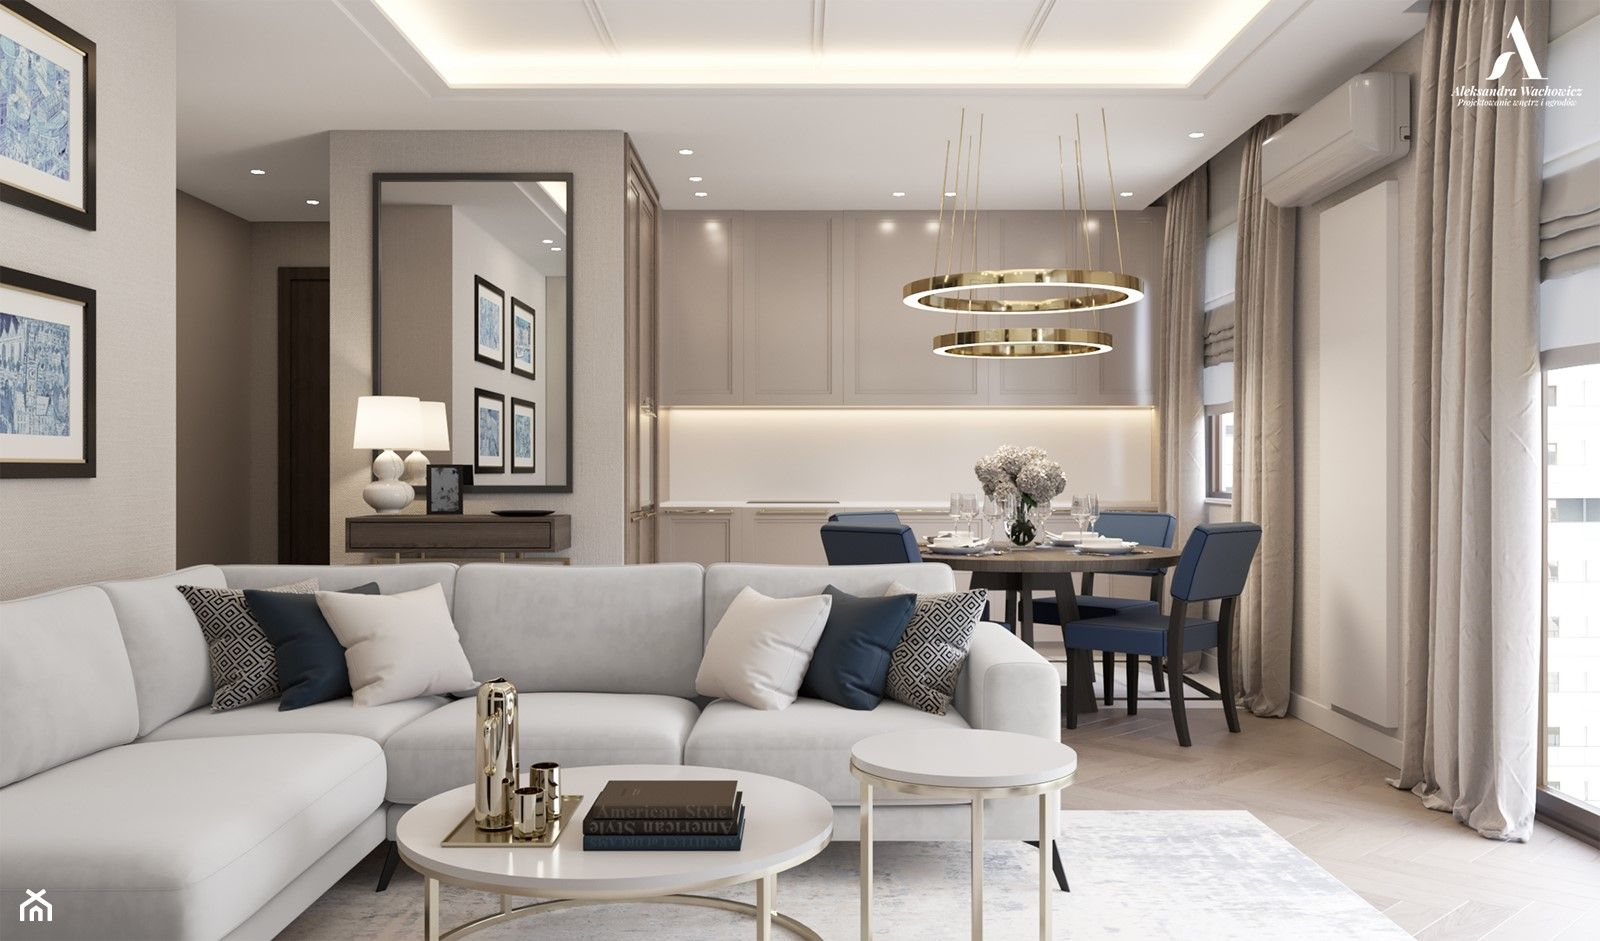 Salon Z Kuchnia Aranzacje Inspiracje I Pomysly Na Modny Wystroj 2020 Modern Classic Living Room Chic Home Decor Home Decor